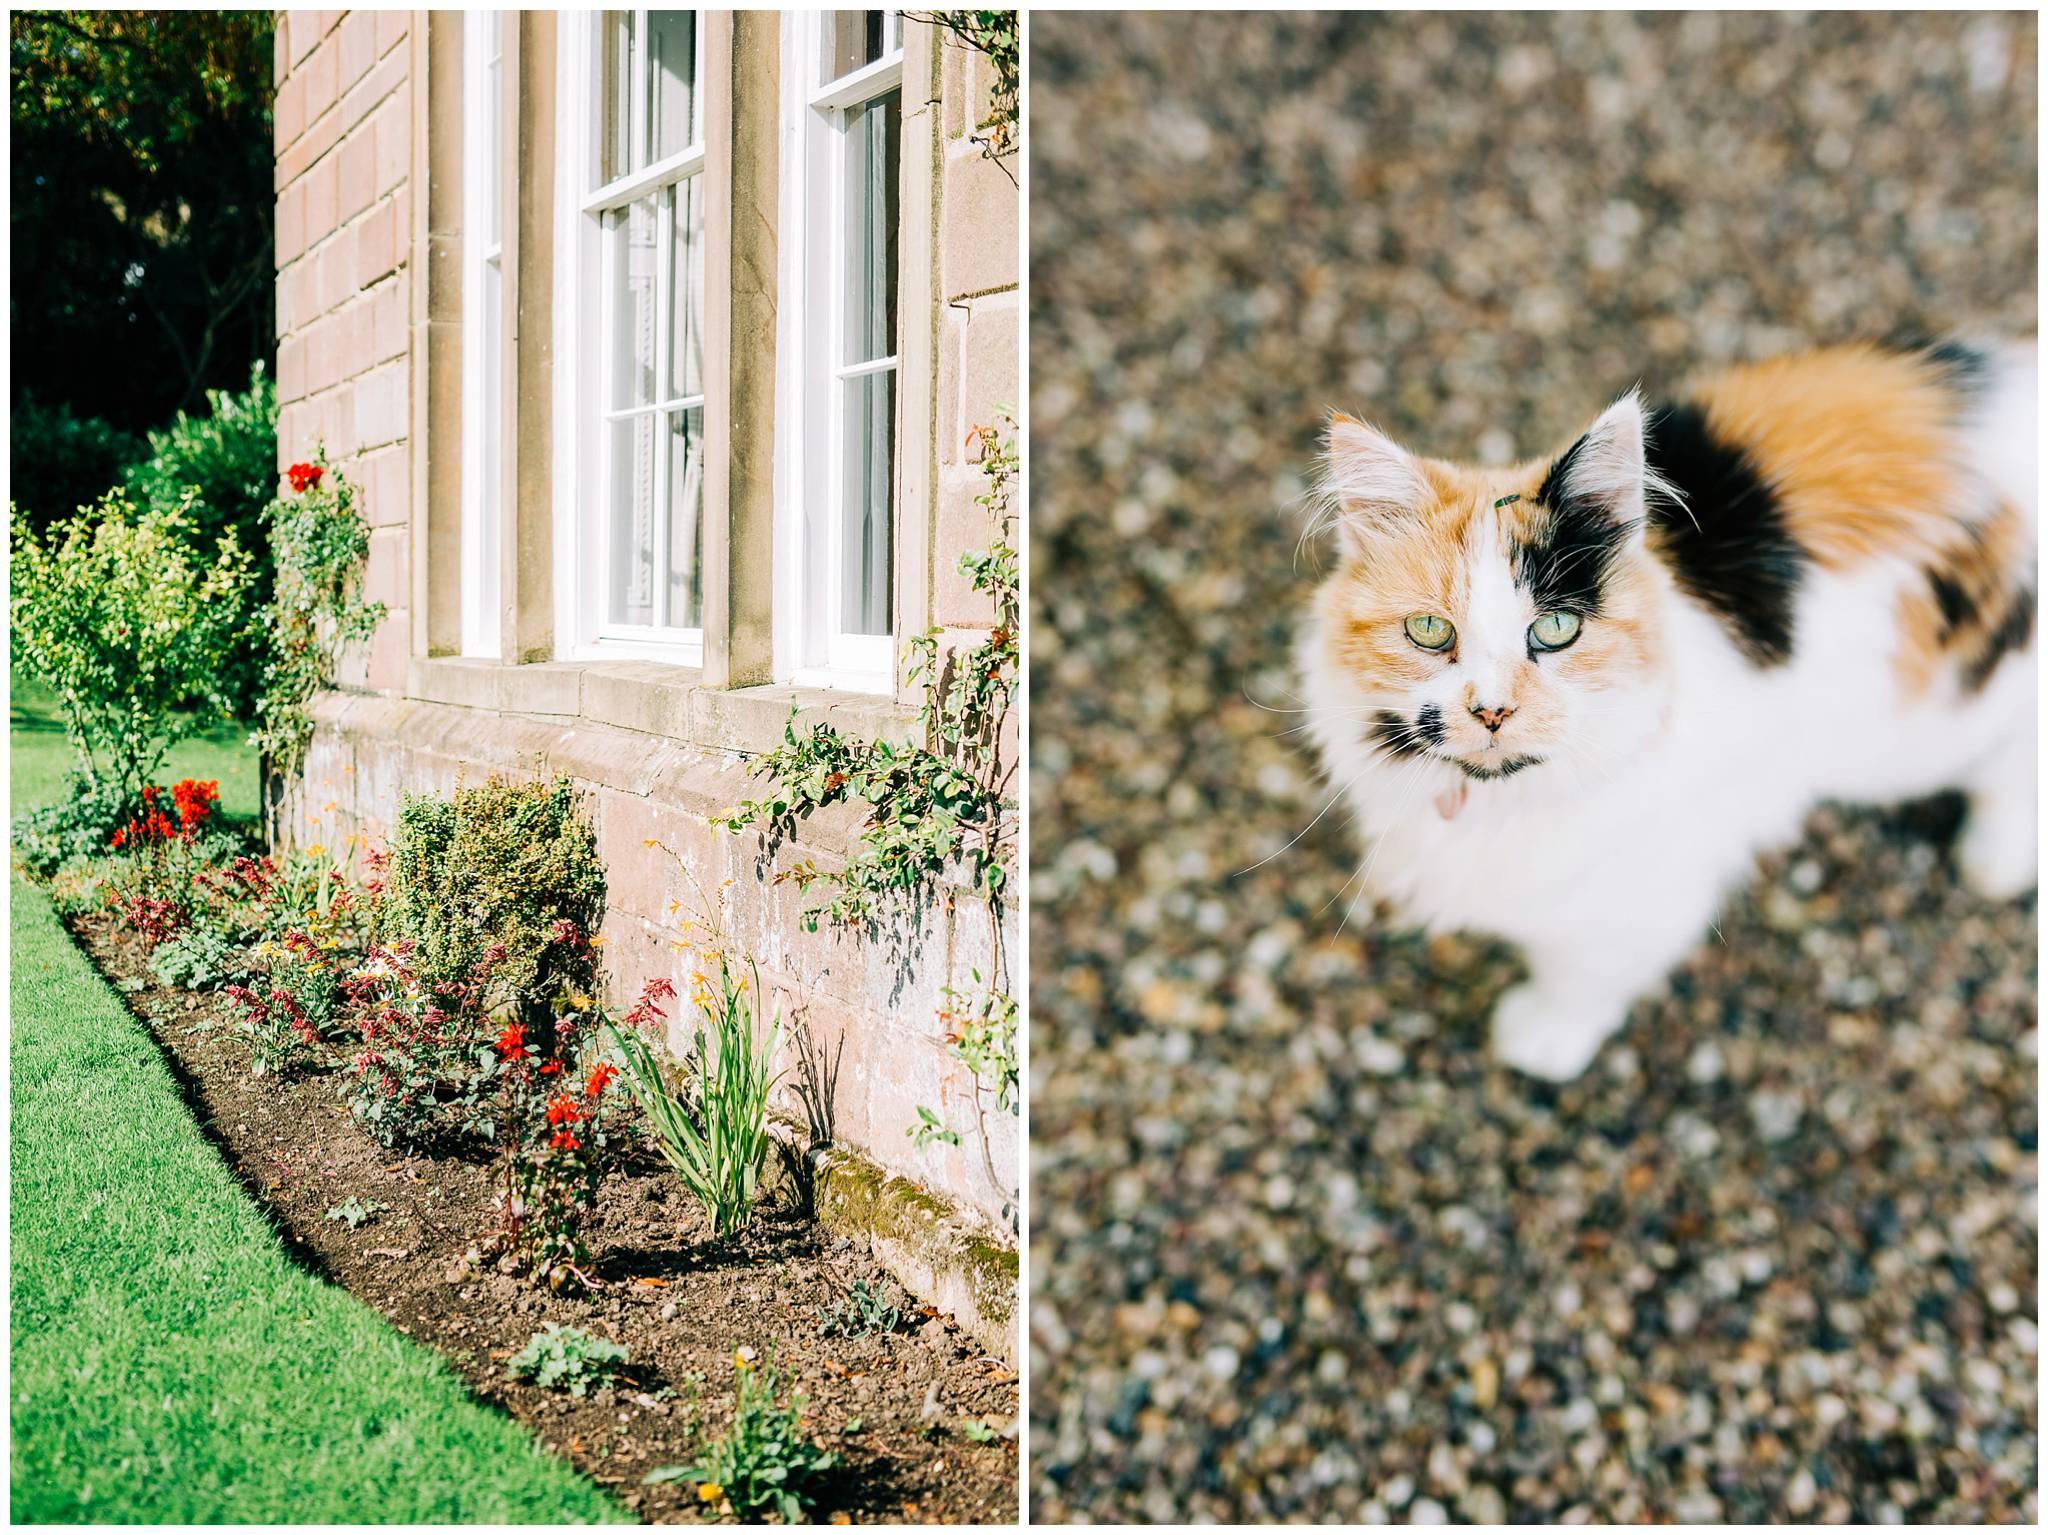 Browsholme bedding plants and the mottled coloured estate cat.